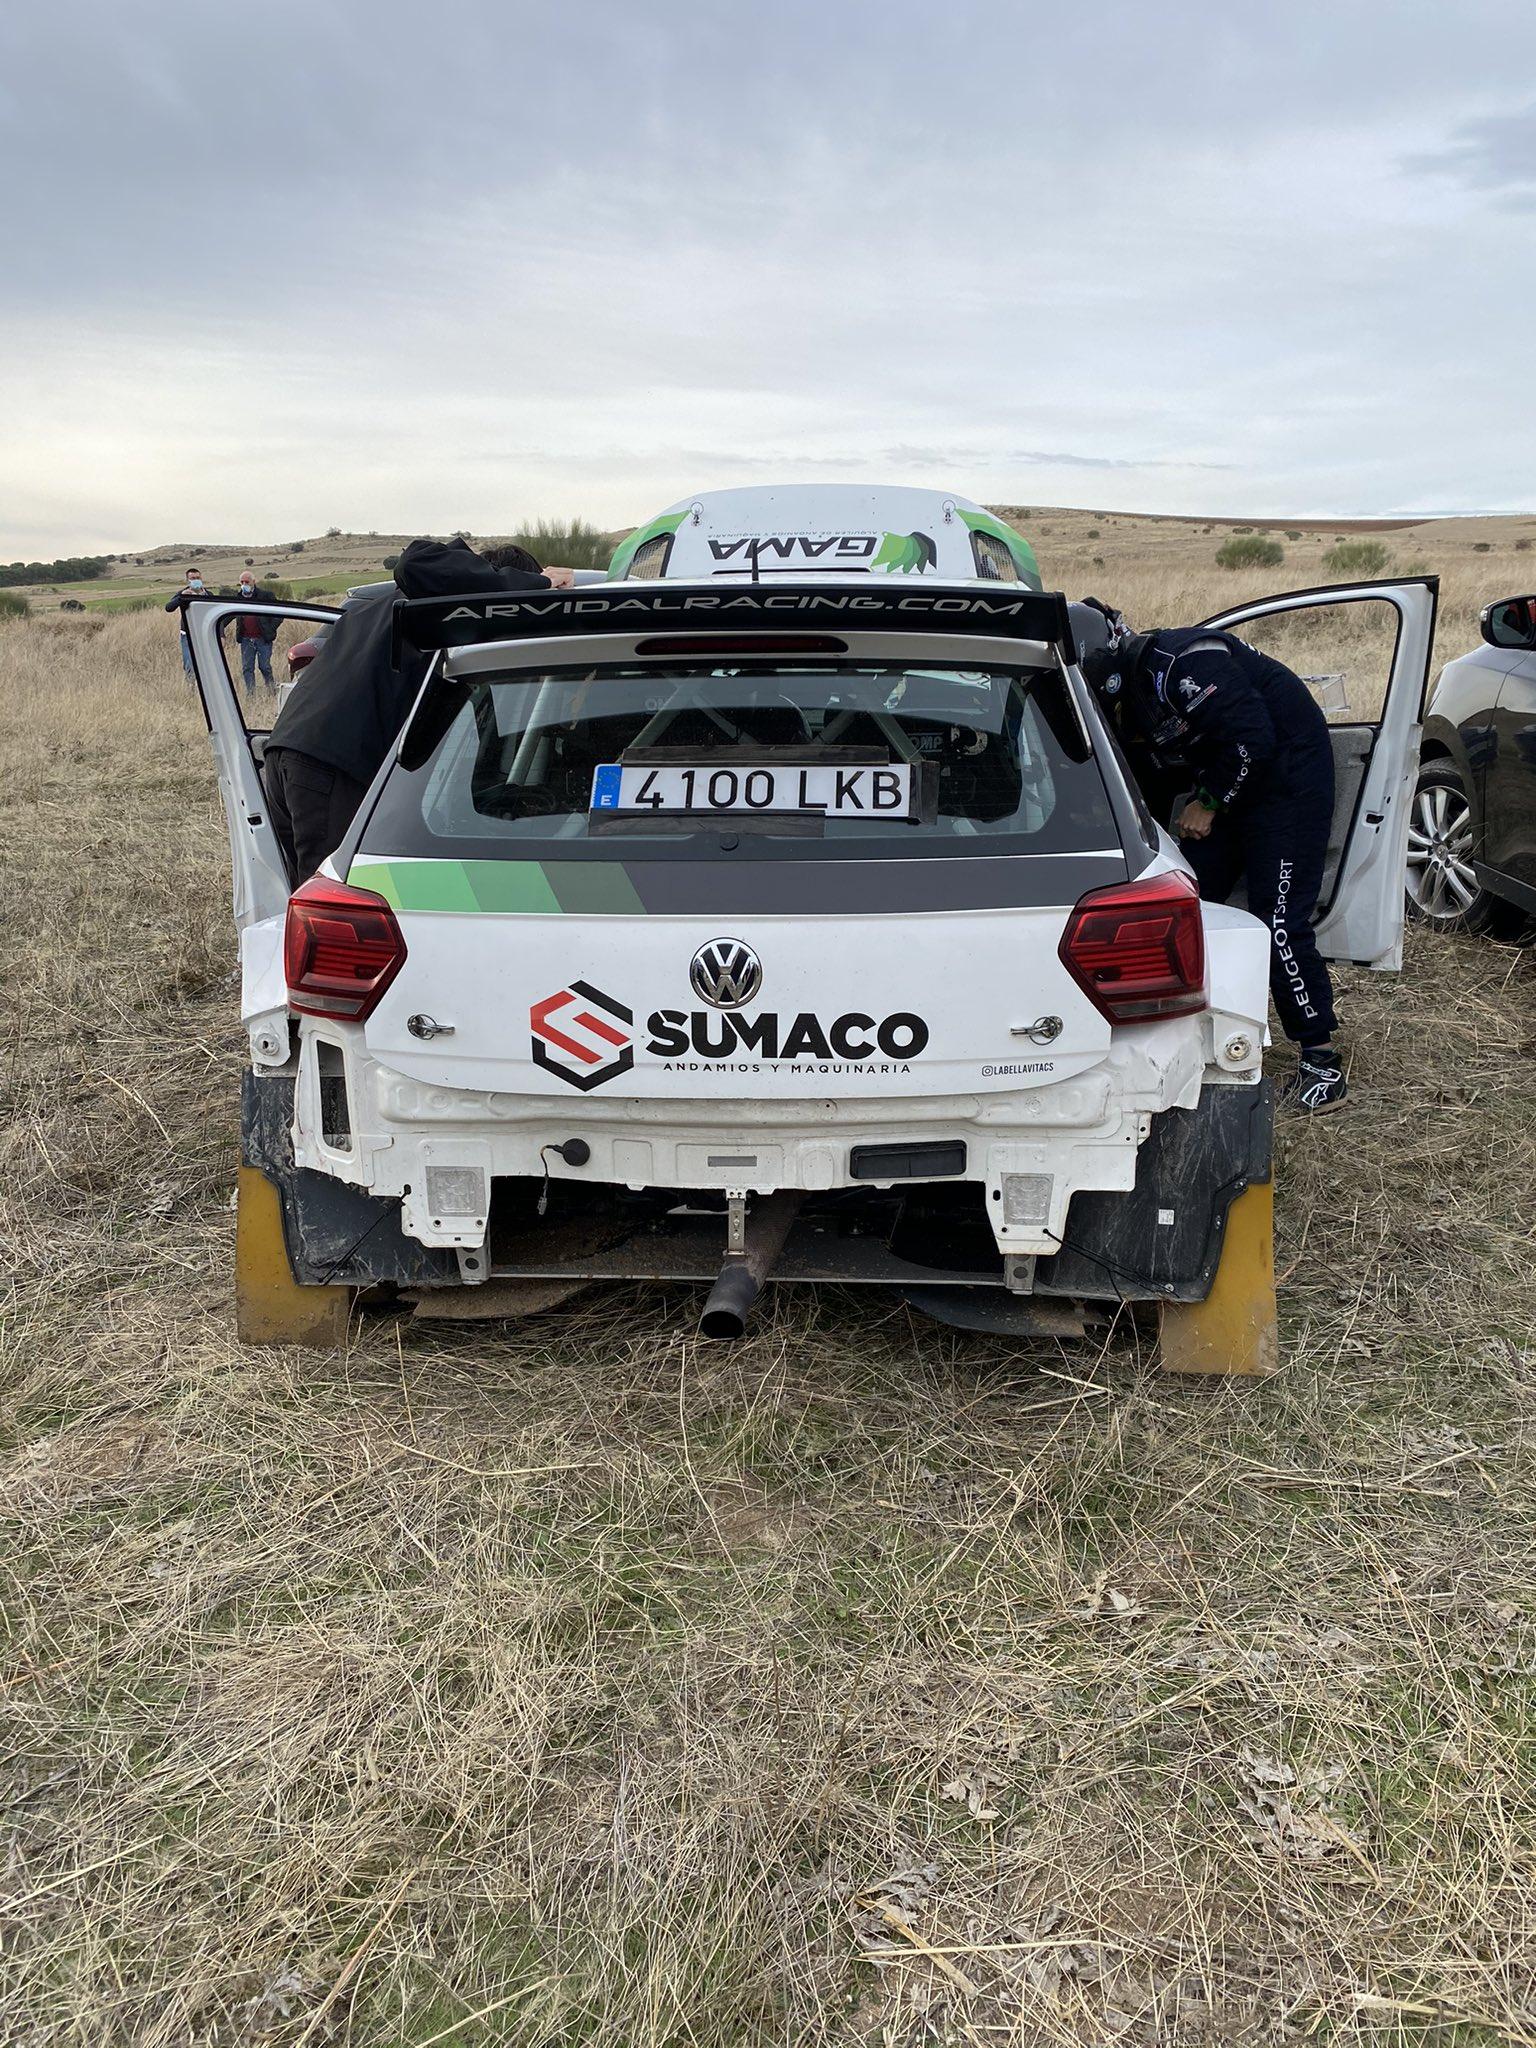 SCER + CERT: Rallye de Tierra de Madrid [13-14 Noviembre] - Página 2 EmpTIHFXUBQAcQX?format=jpg&name=large